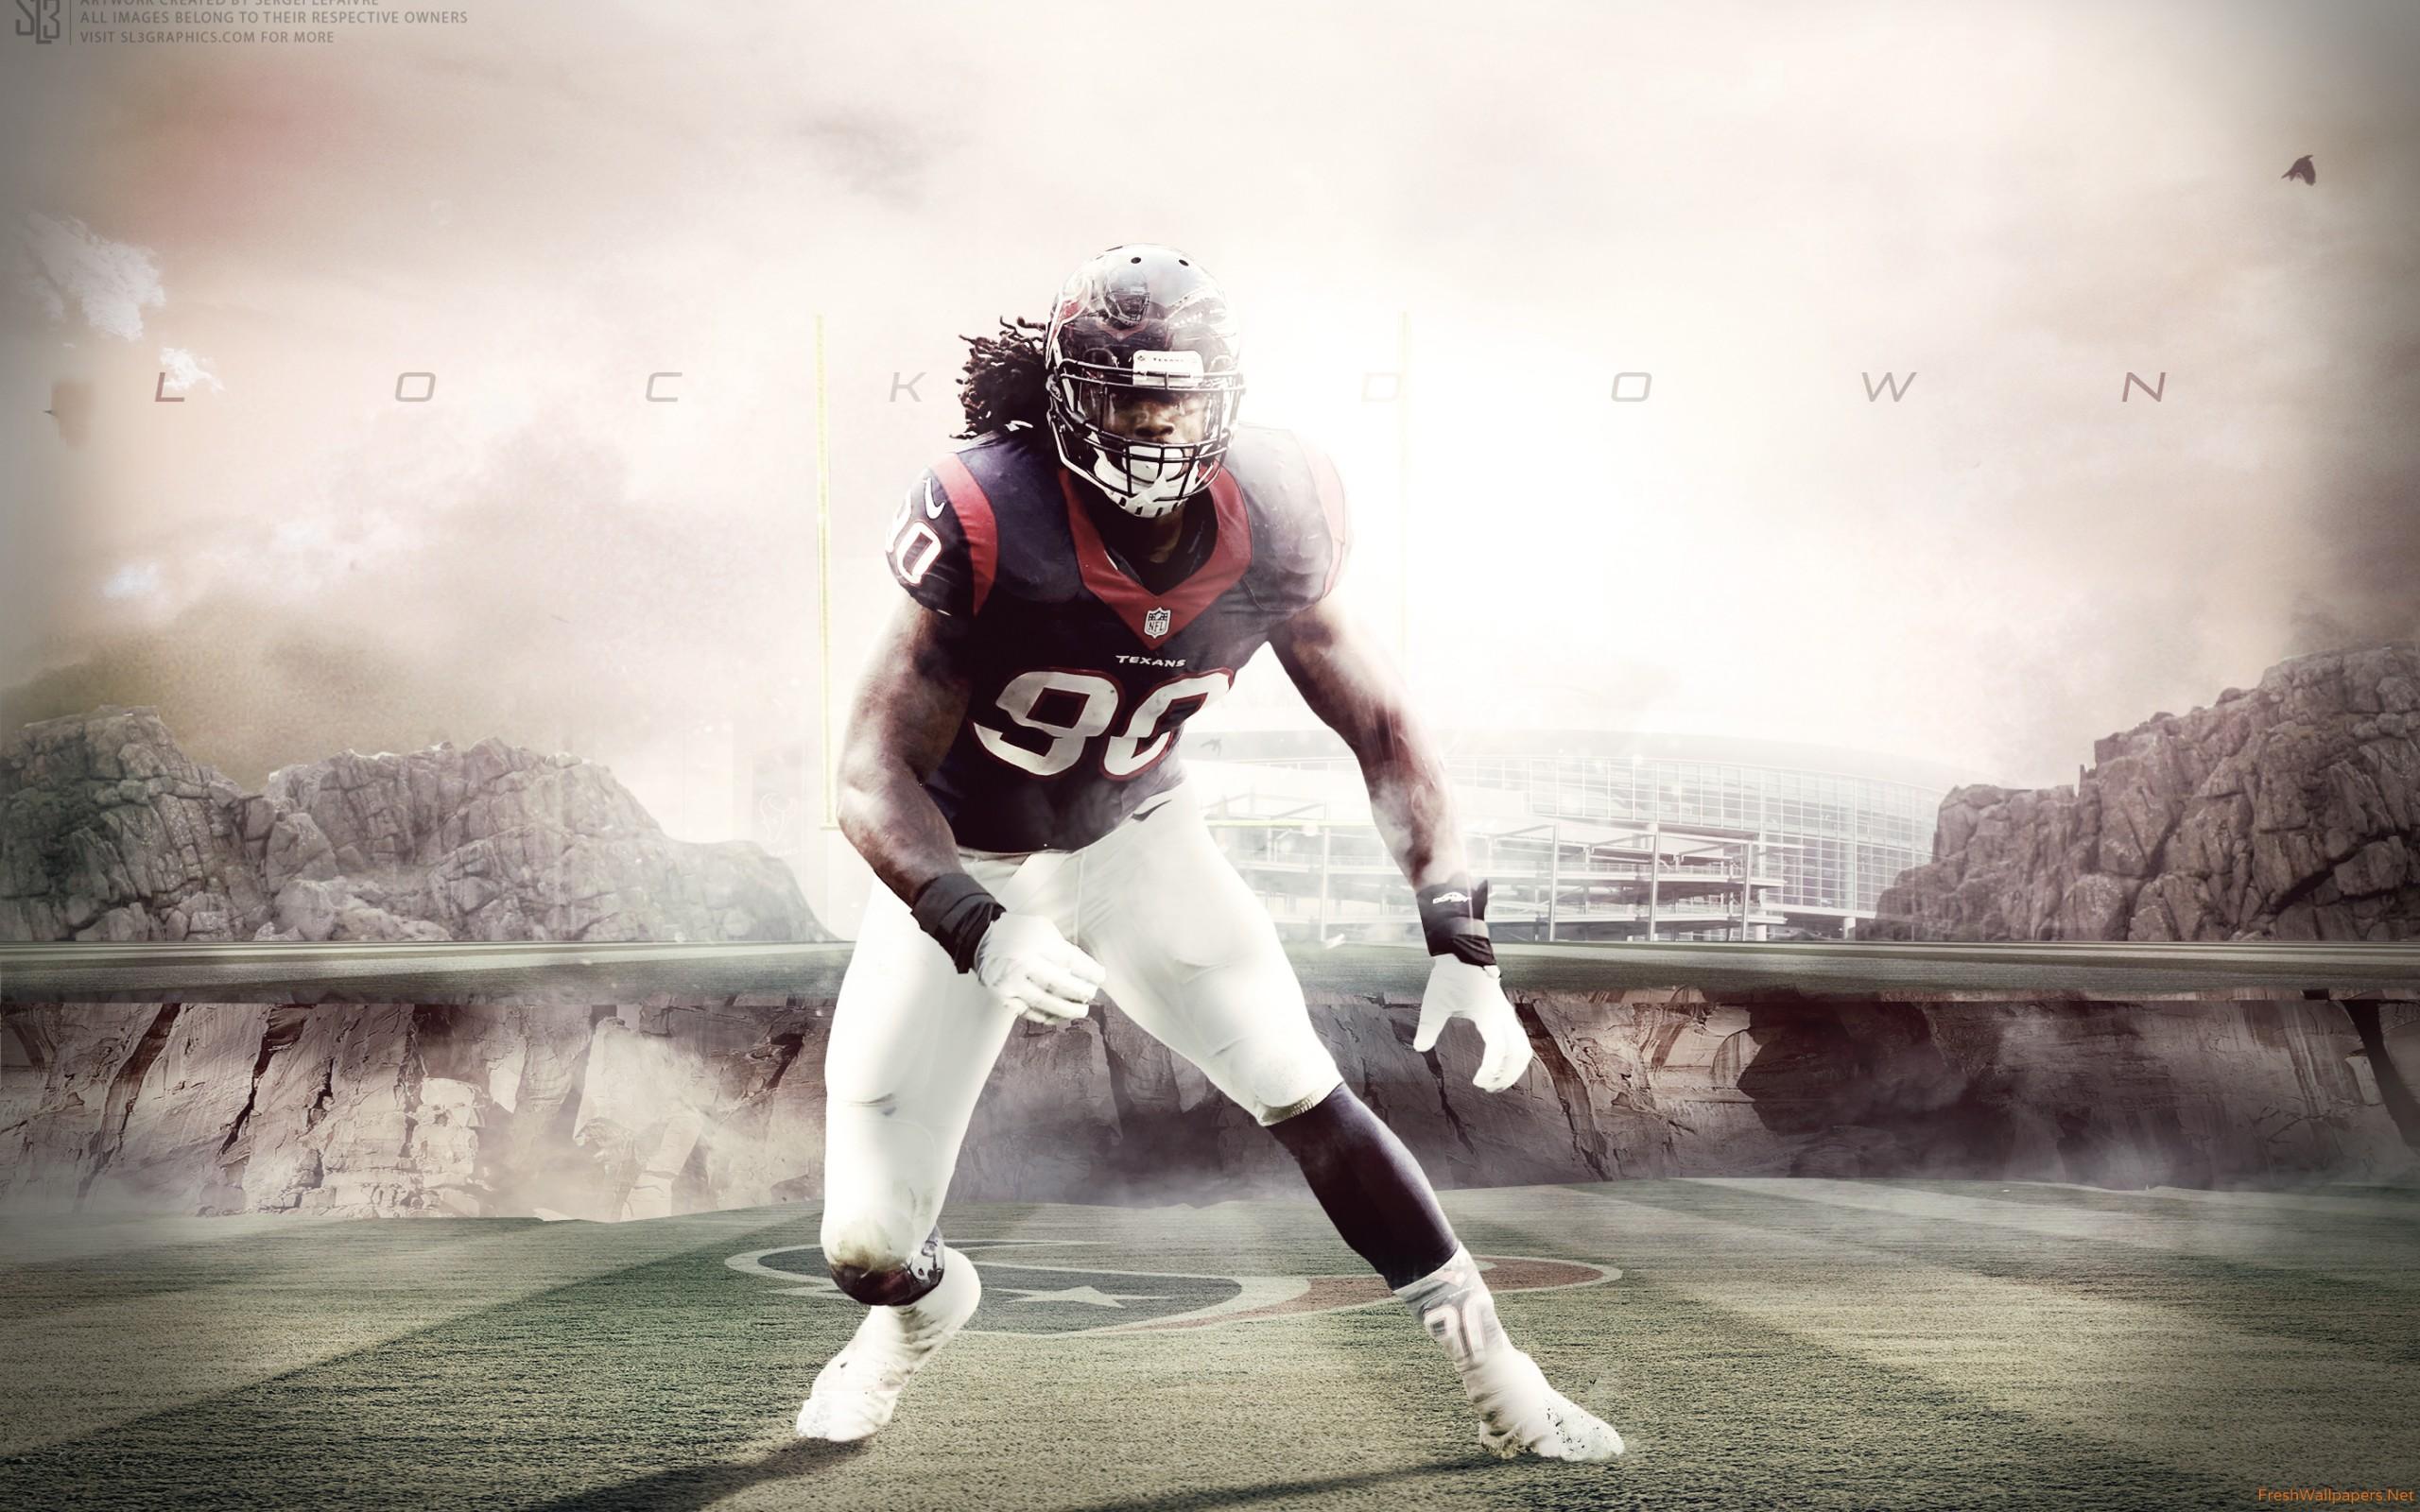 Jadeveon Clowney 2015 Houston Texans NFL wallpapers Freshwallpapers 2560x1600